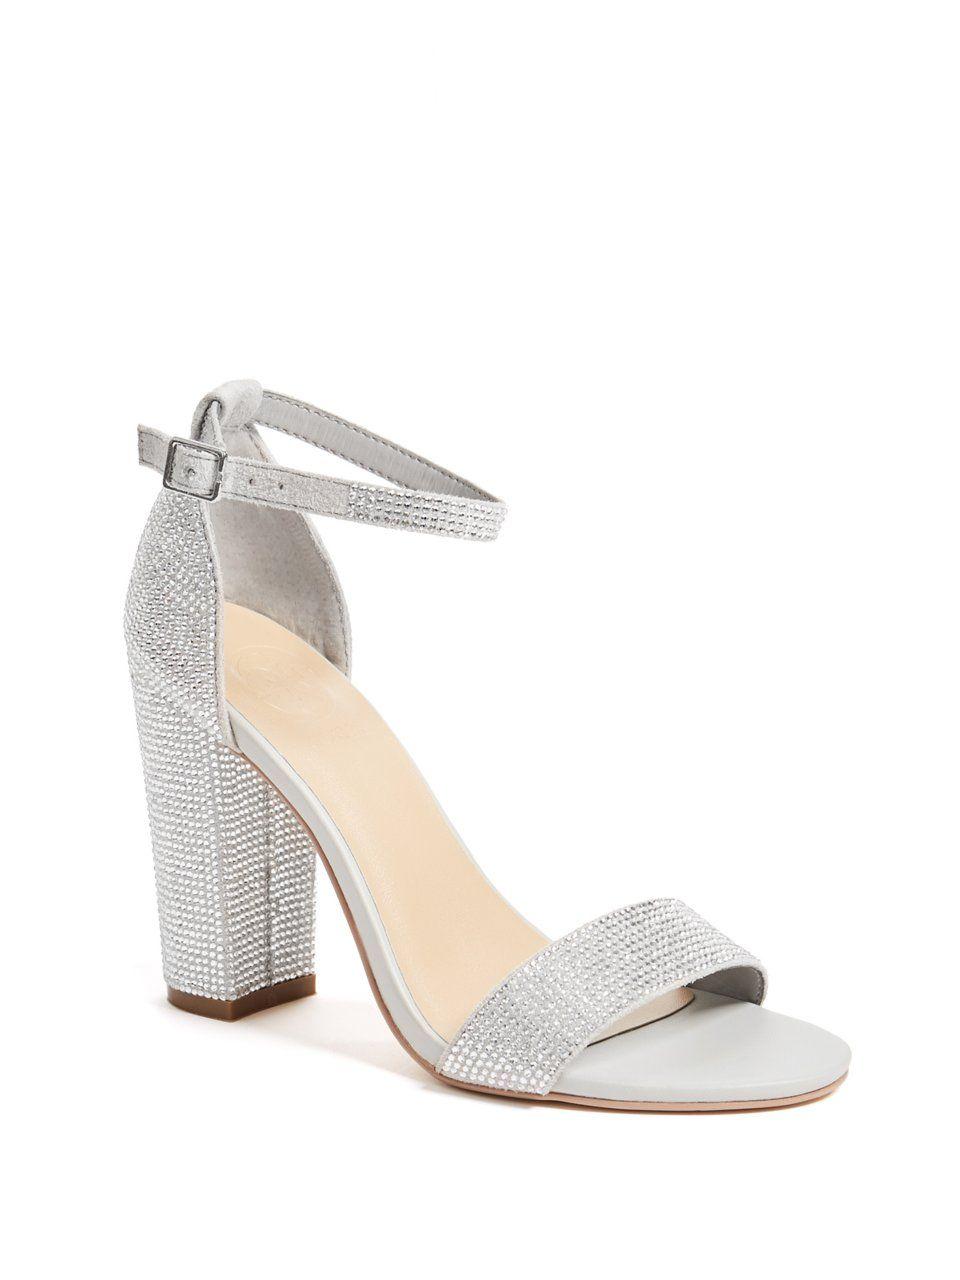 1c11a5296393 Disco Rhinestone Ankle-Strap Heels in 2019